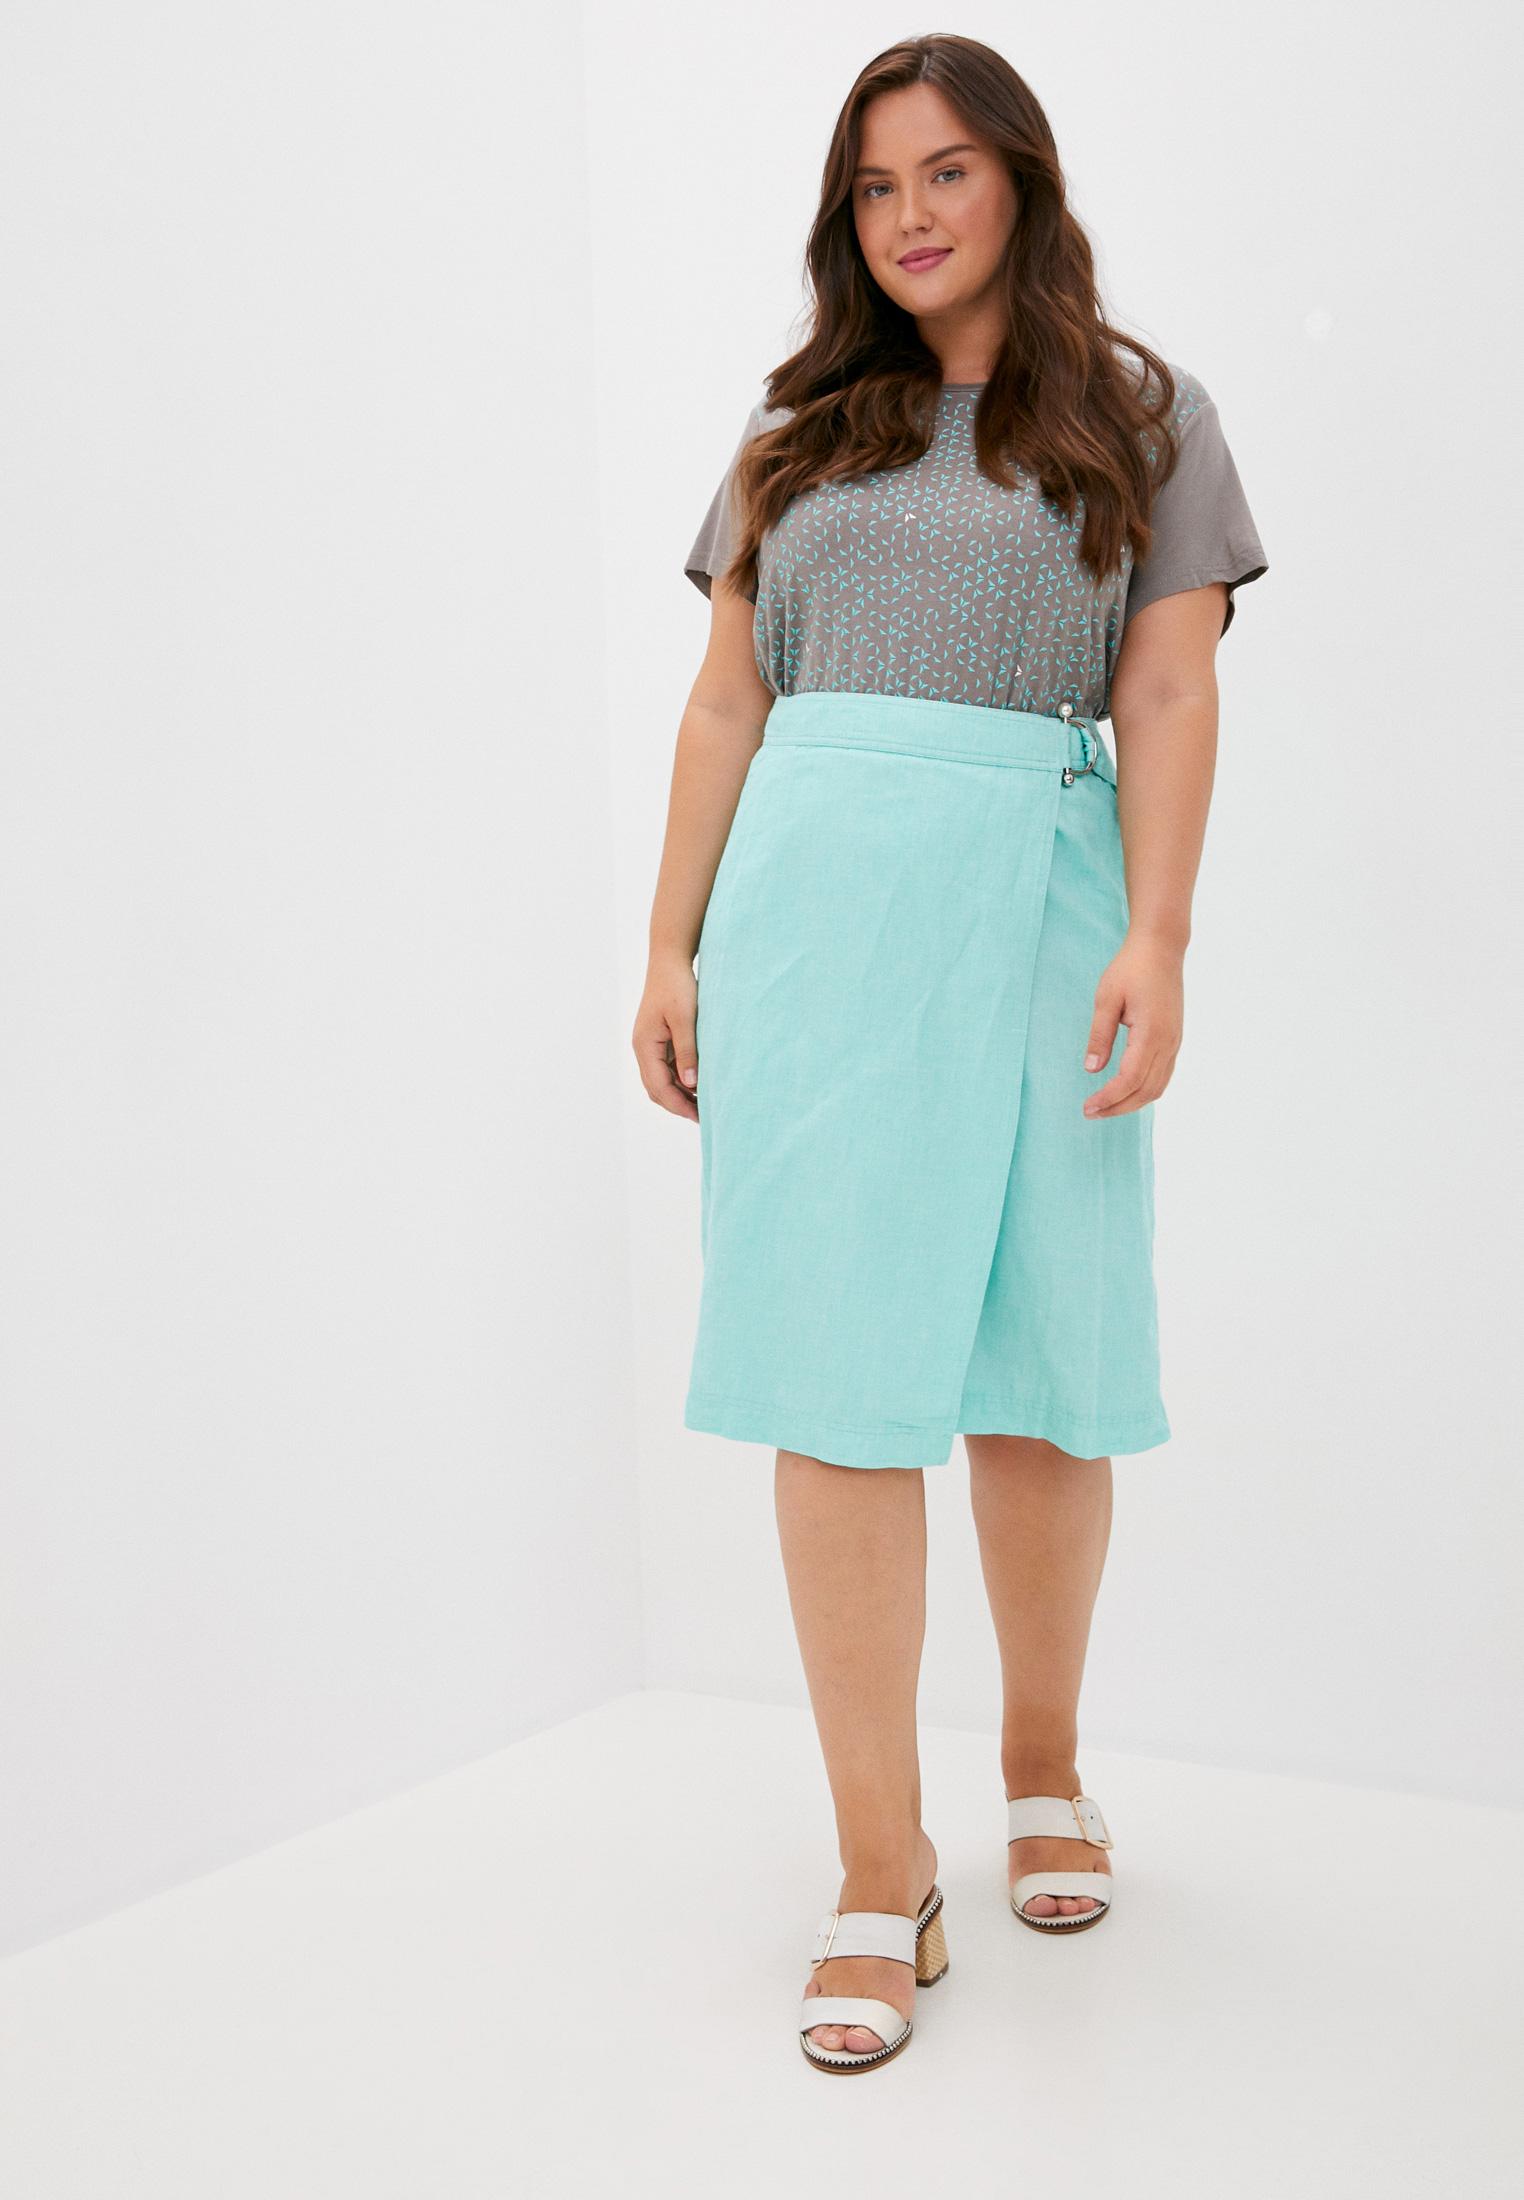 Прямая юбка Finn Flare (Фин Флаер) S18-11012: изображение 2